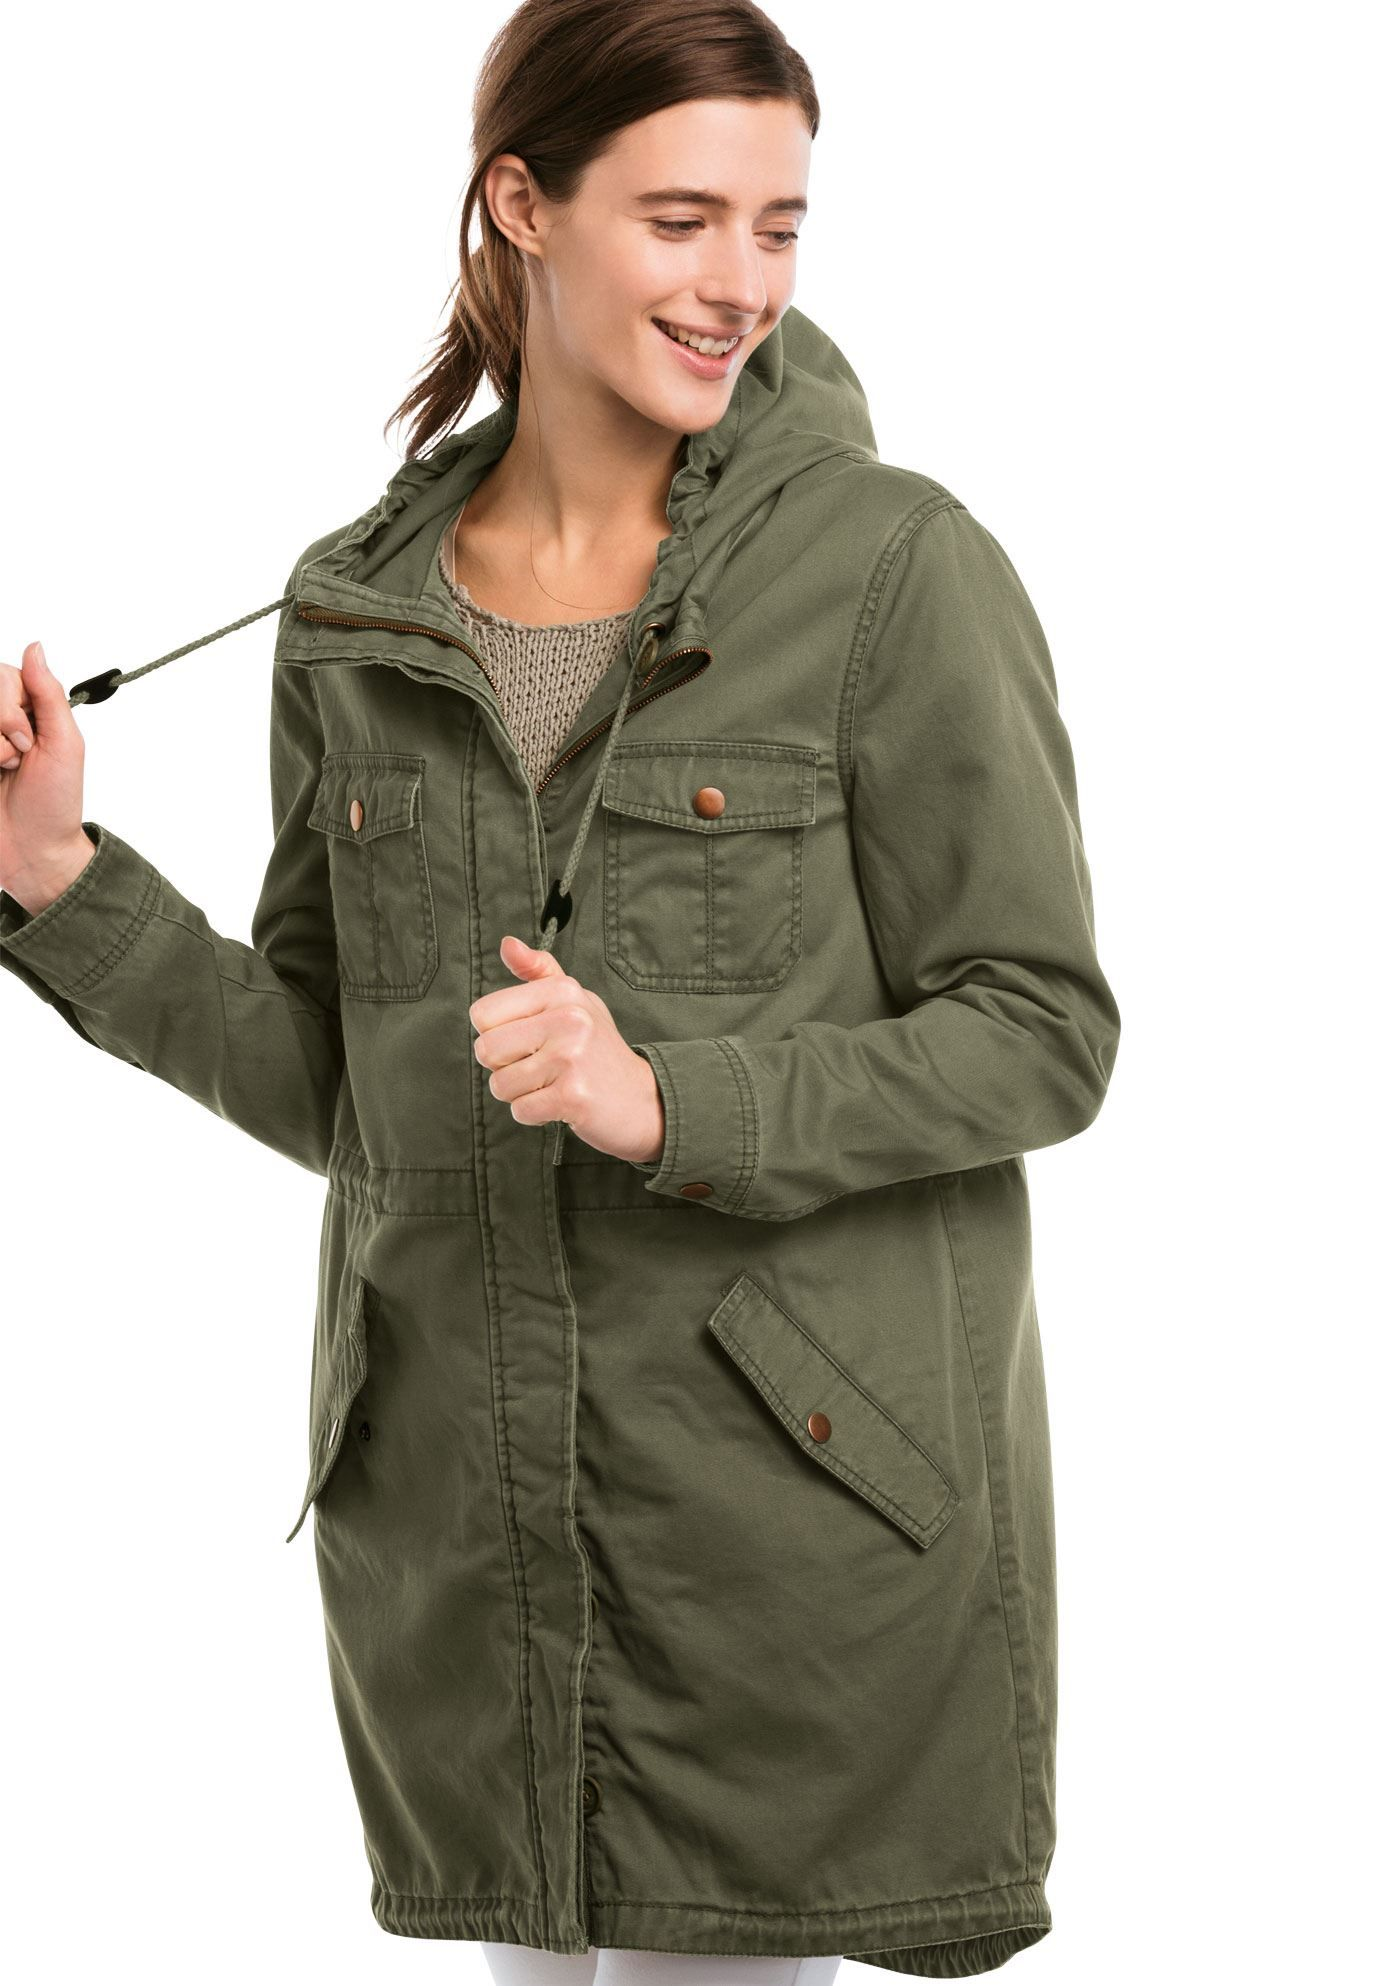 224c907b039 Ellos Hooded Twill Anorak Jacket - Women s Plus Size Clothing ...